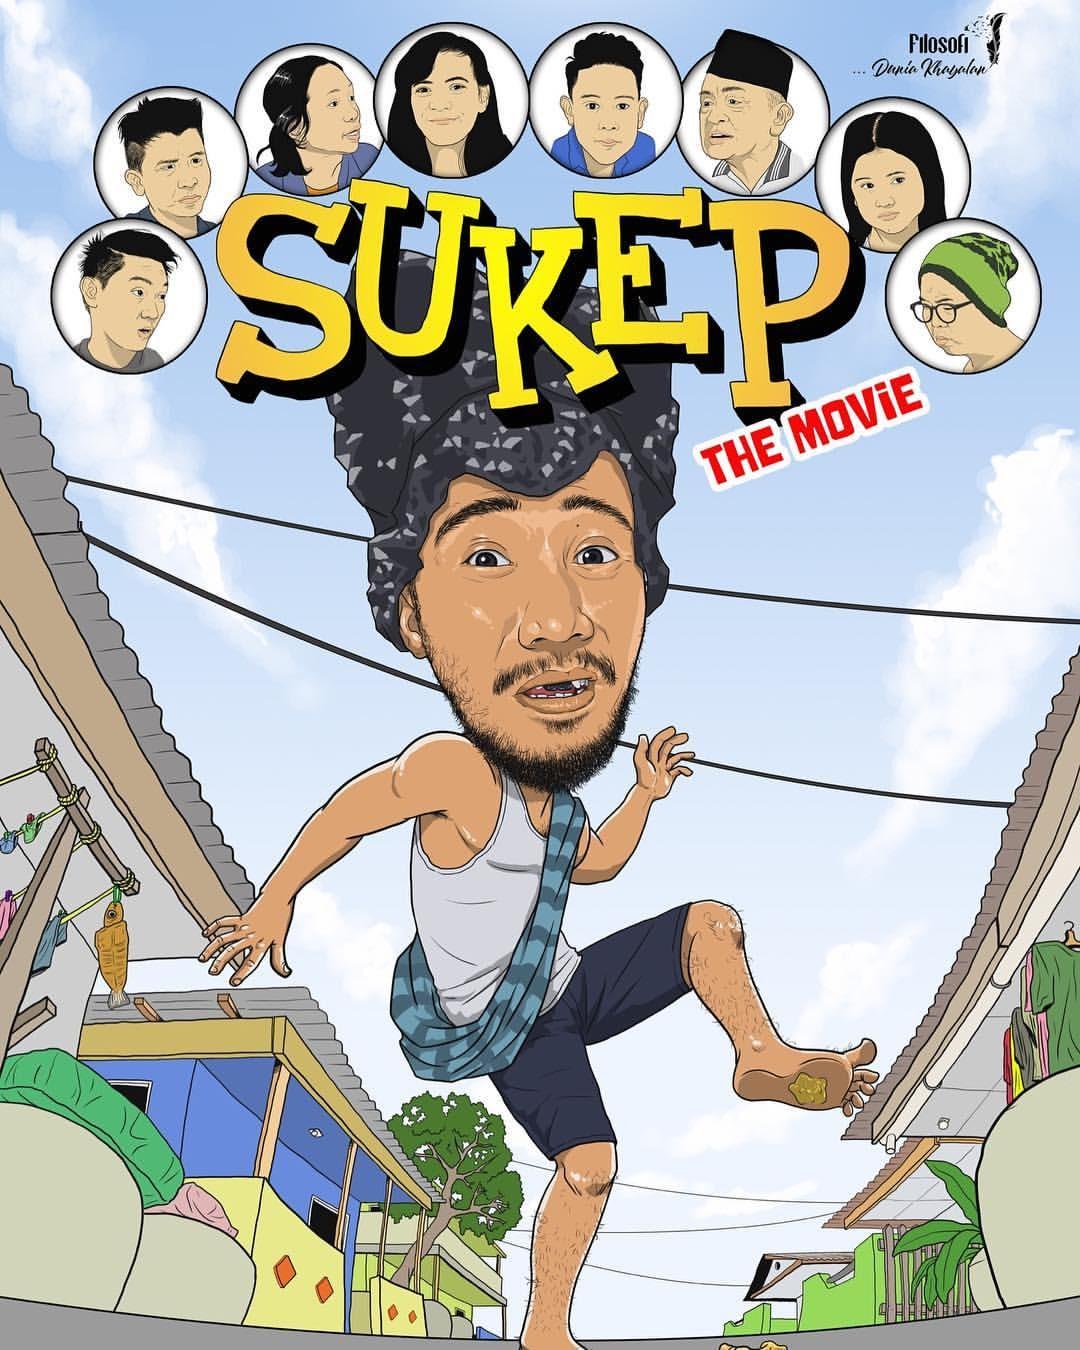 Sukep The Movie, Film Kedua yang Tidak Tayang di Bioskop Semarang Tahun 2019